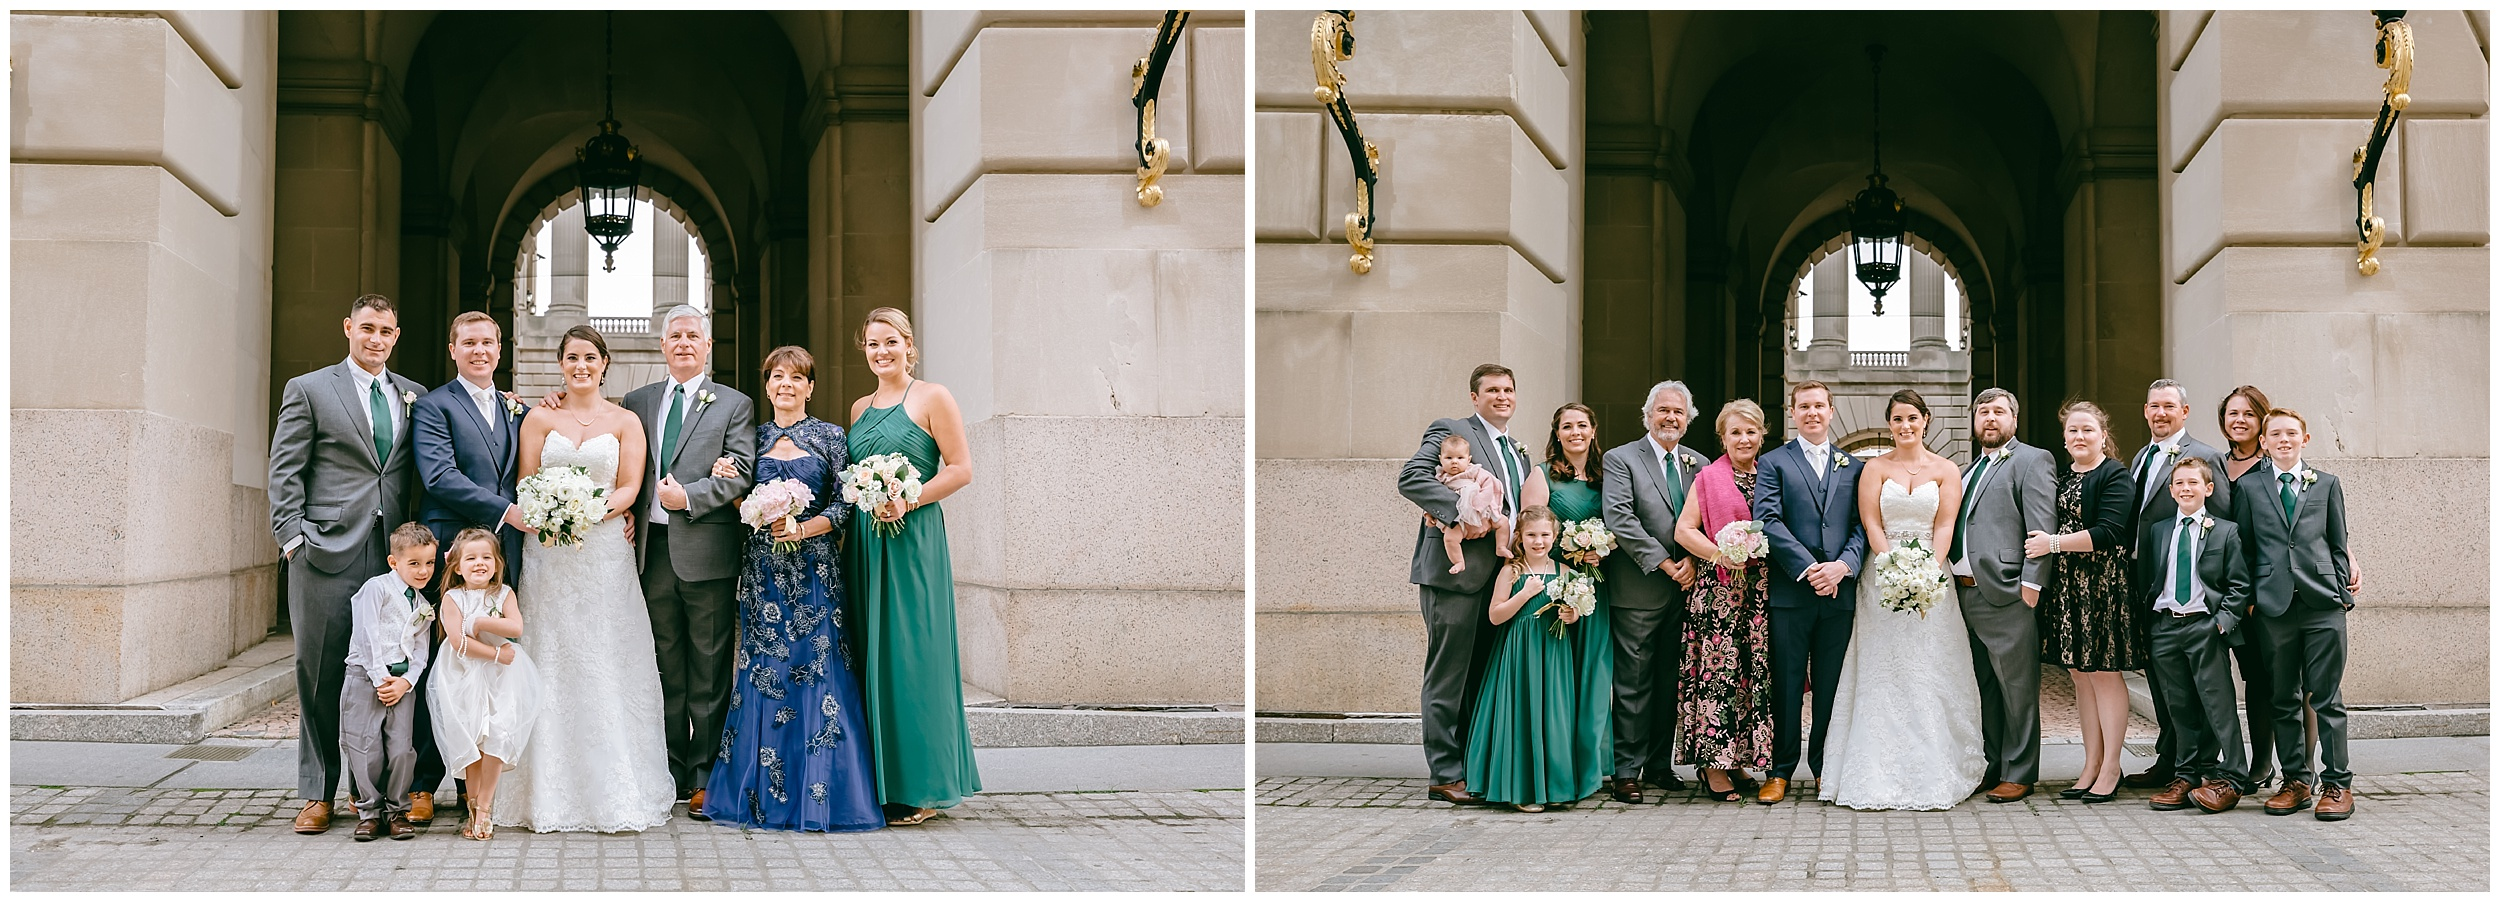 wedding-party-bridal-formal-family-portraits-washington-dc-photographer